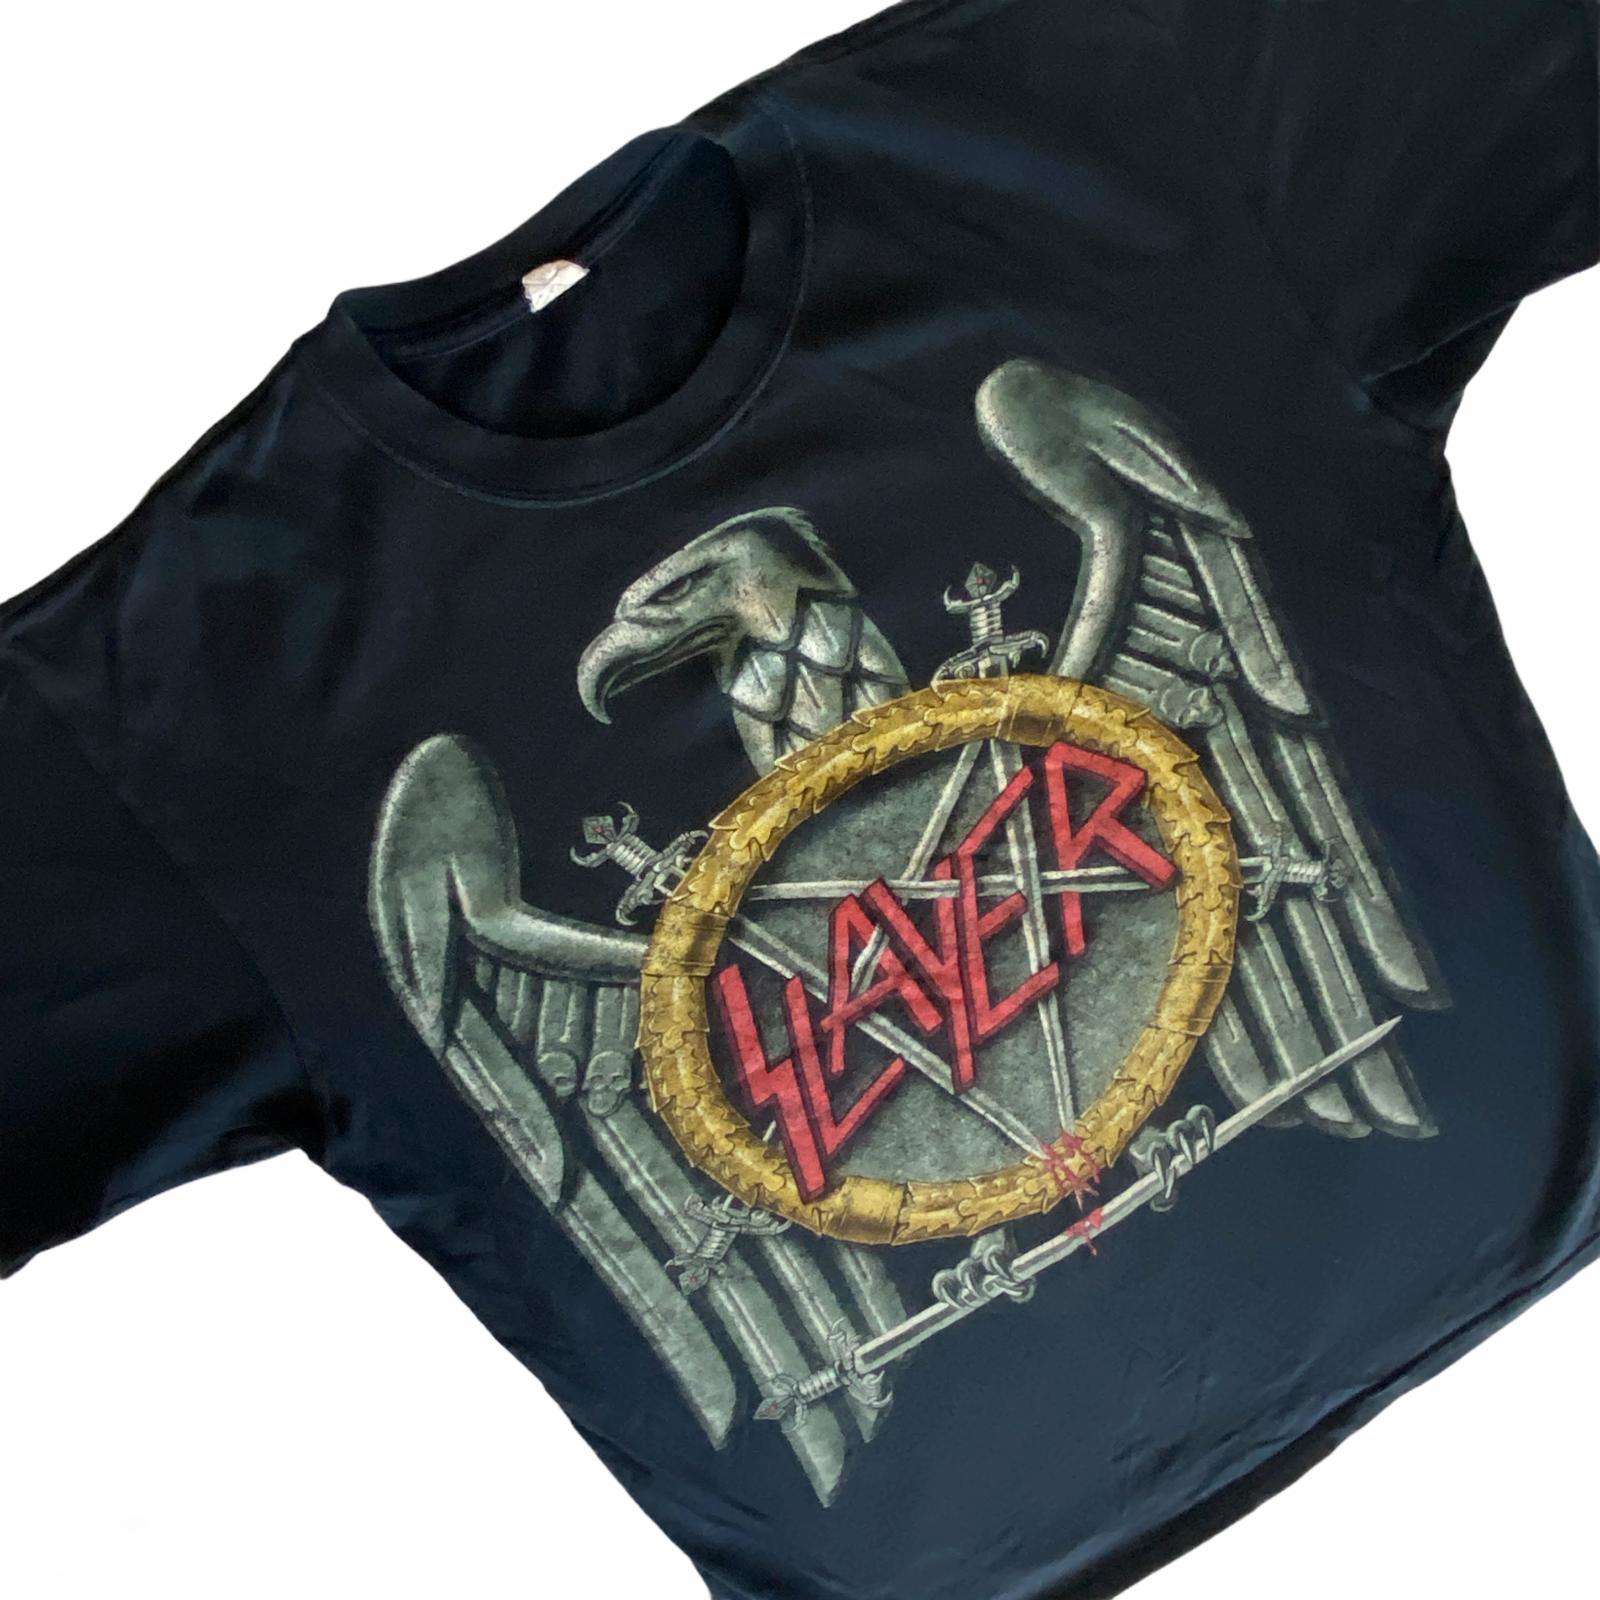 Slayer Psychopathy Tour 2009 Heavy Metal Concert T-Shirt Black Large Rock Band  - $26.99